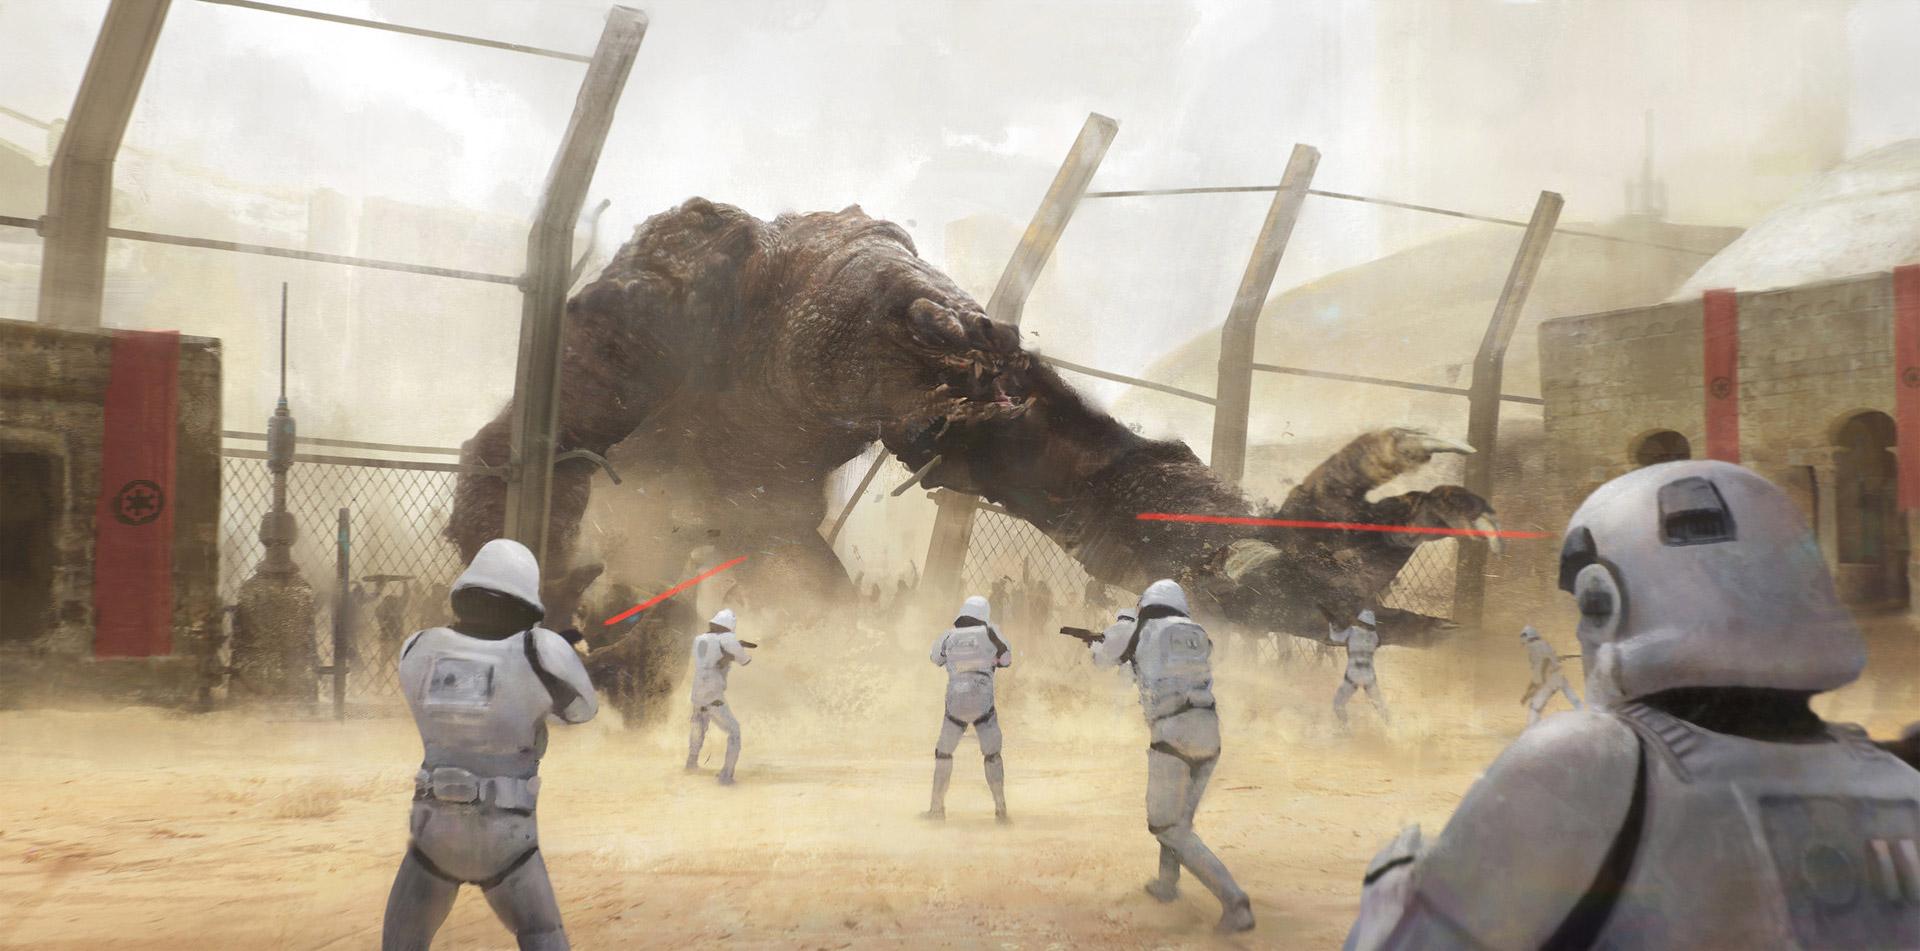 The Sci-Fi & Star Wars Art of Nikolay Razuev